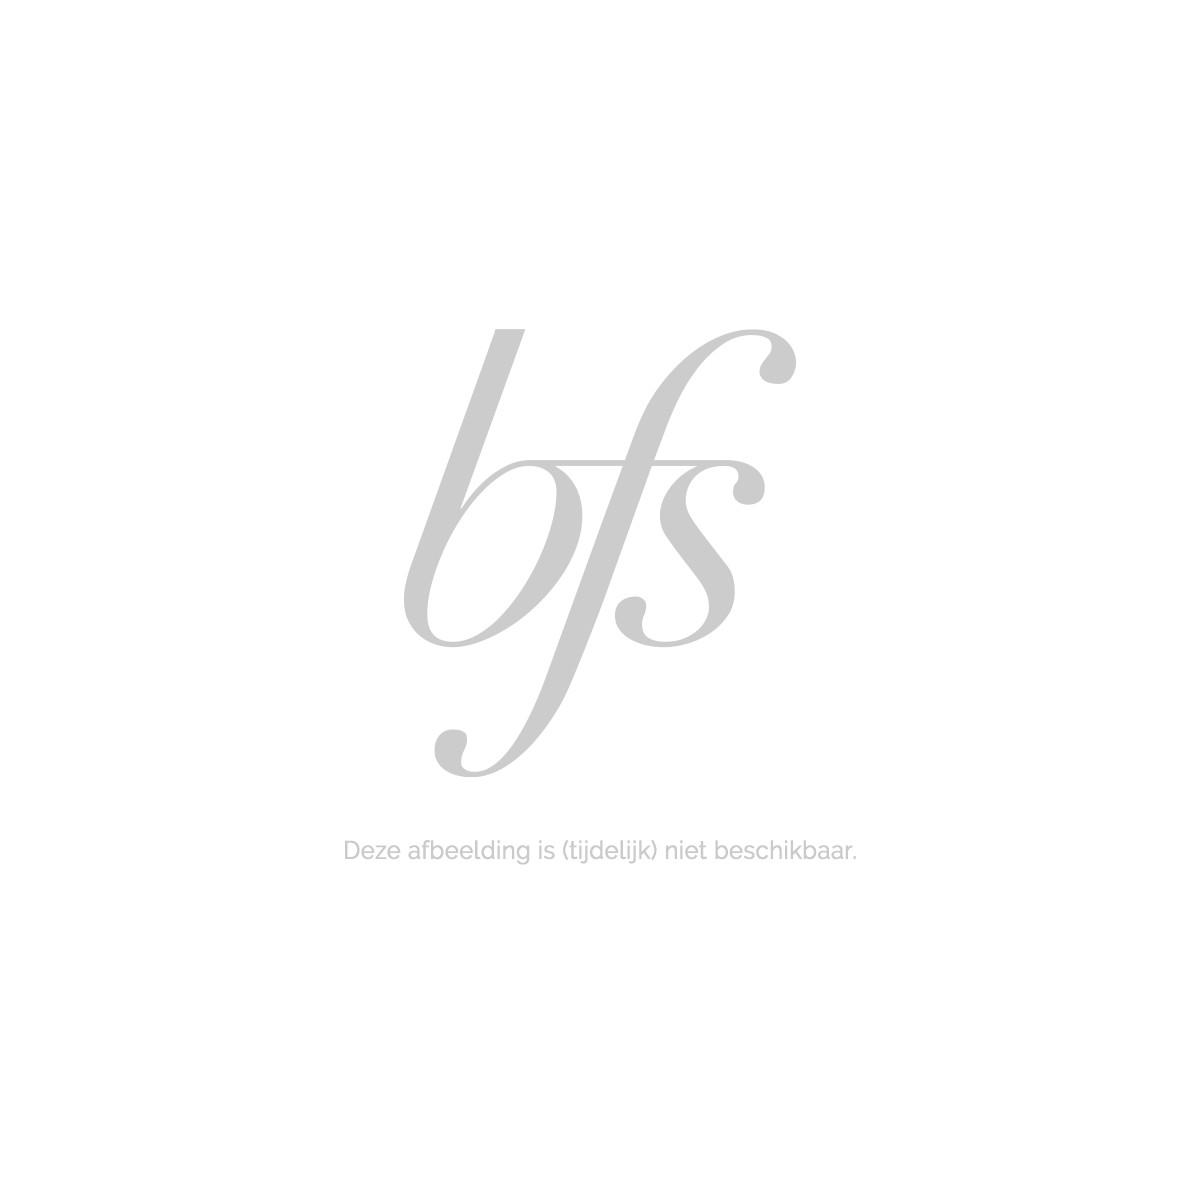 Care By Bema The Nail Buffer + The Nail File 80/80 + The Nail Wipes